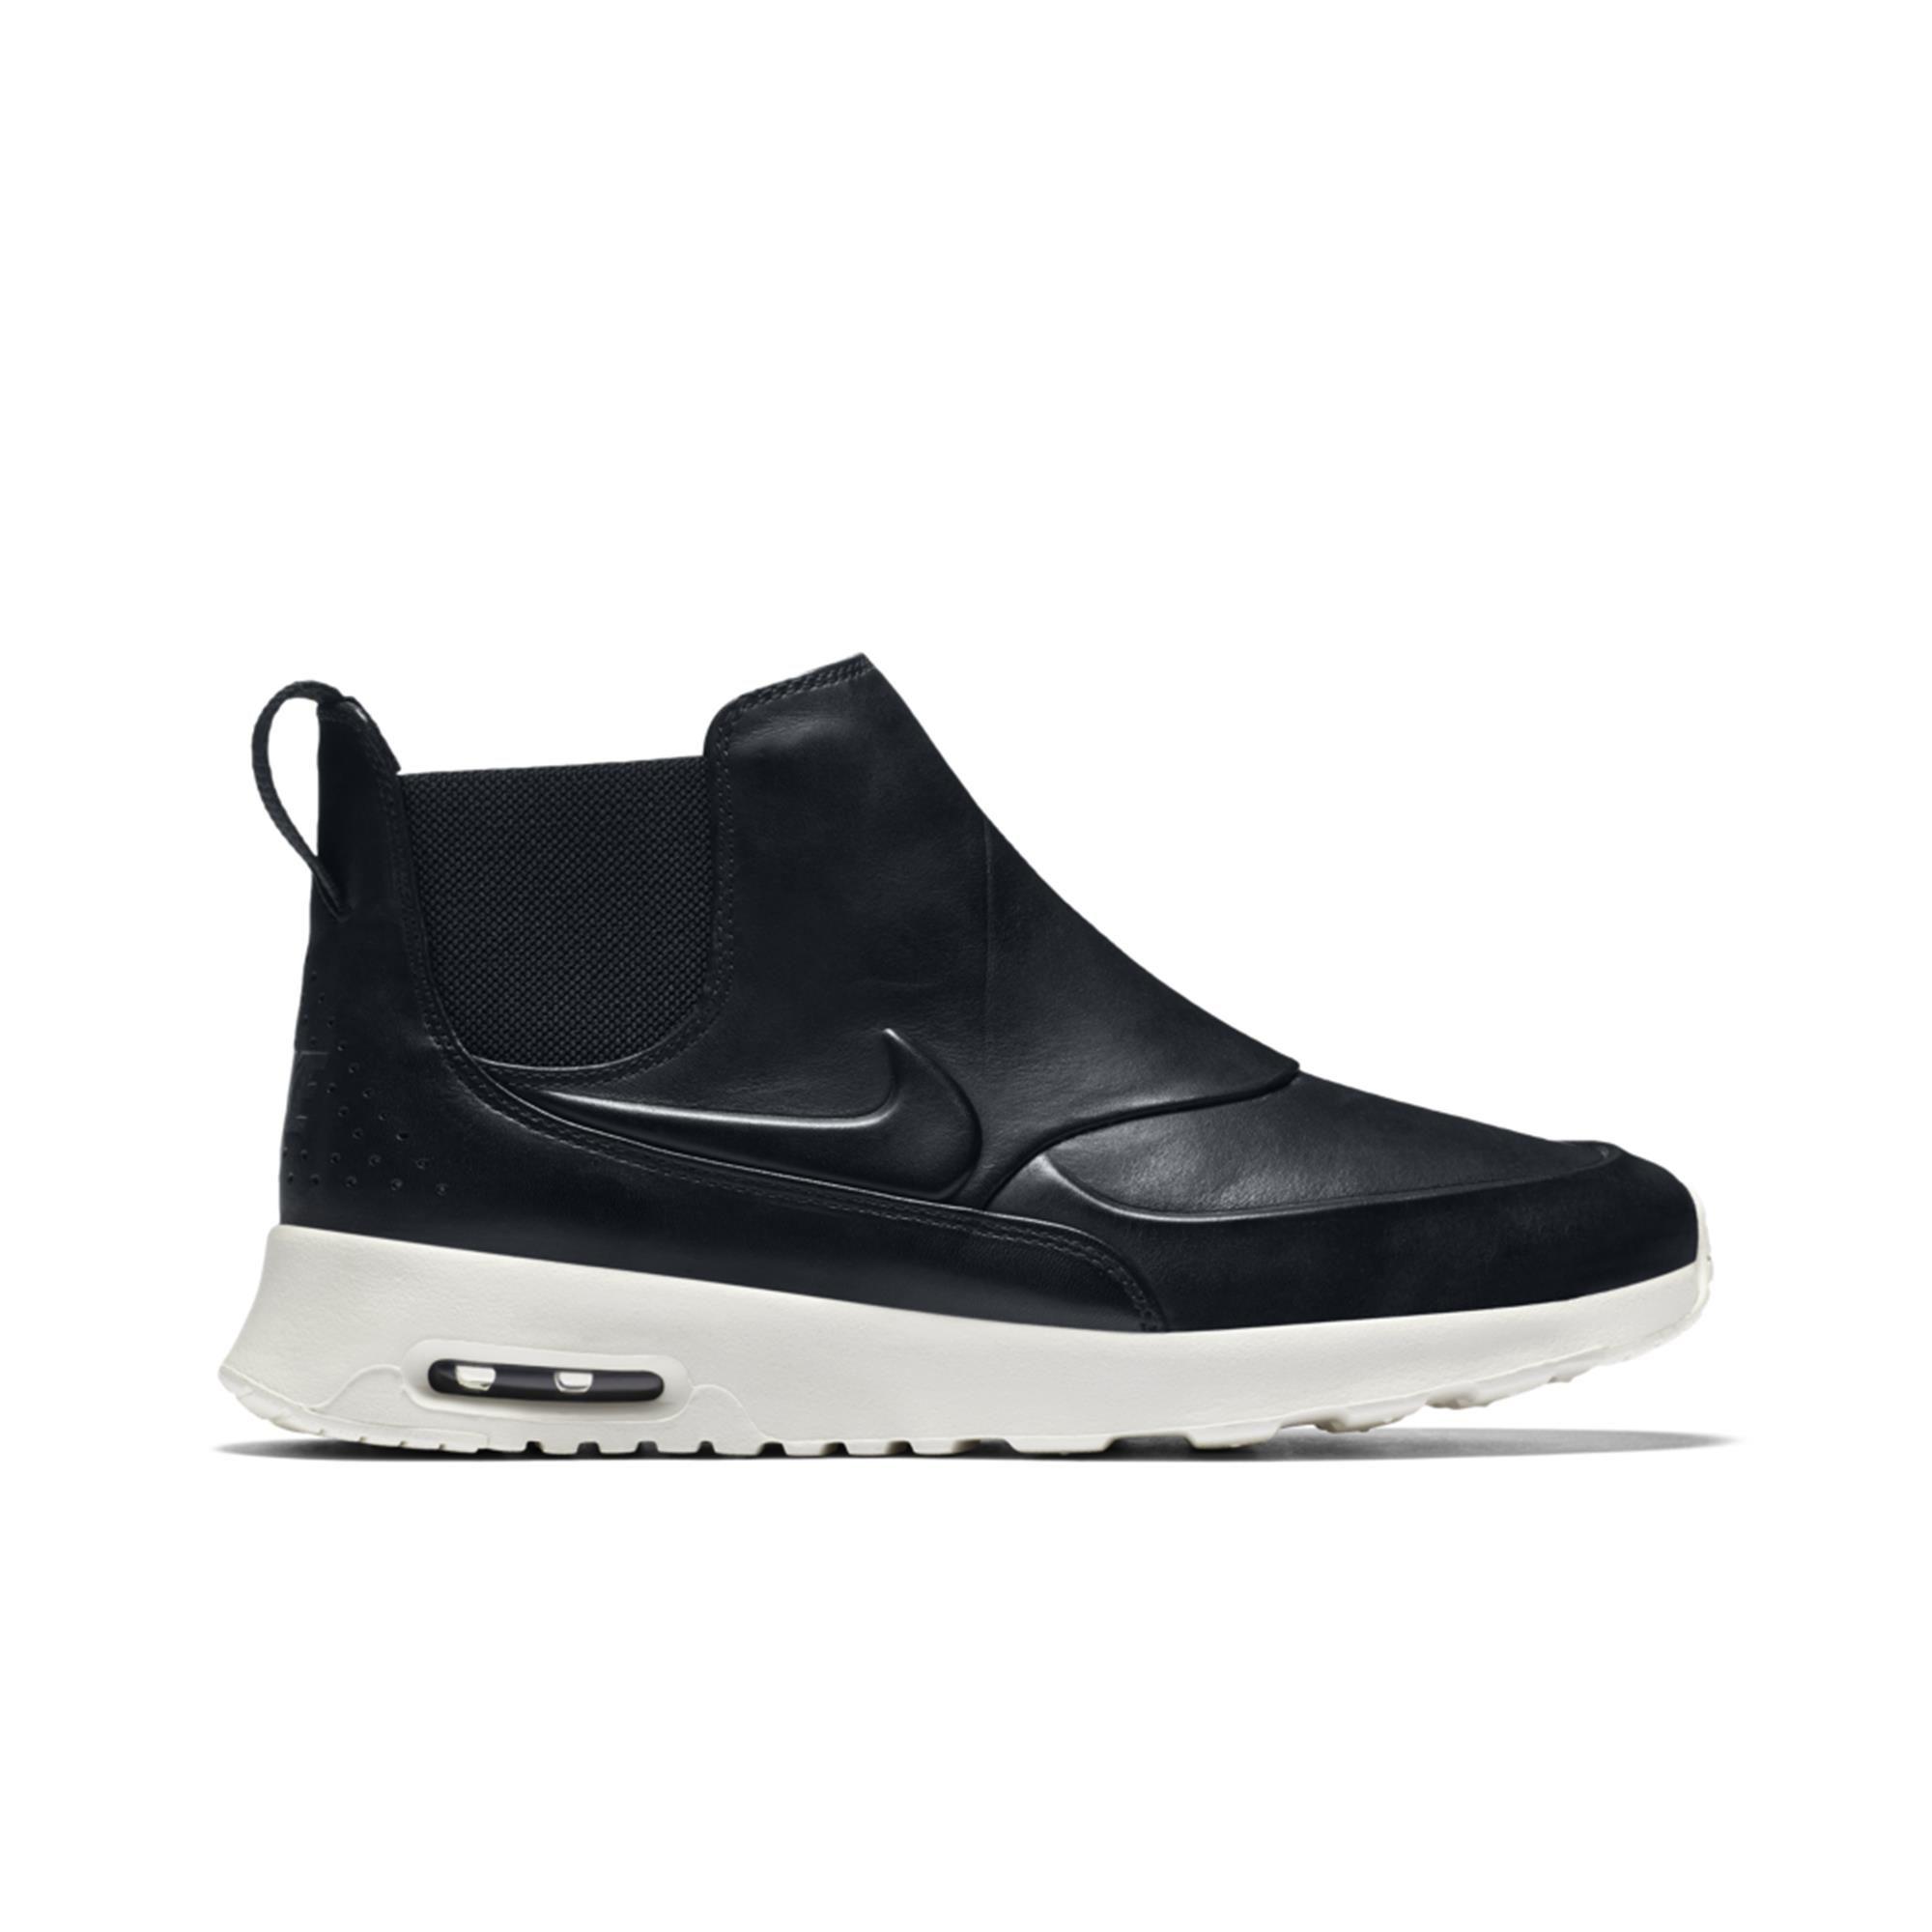 cheaper 34f94 af8c1 Tênis Nike Air Max Thea Mid Feminino   Nike